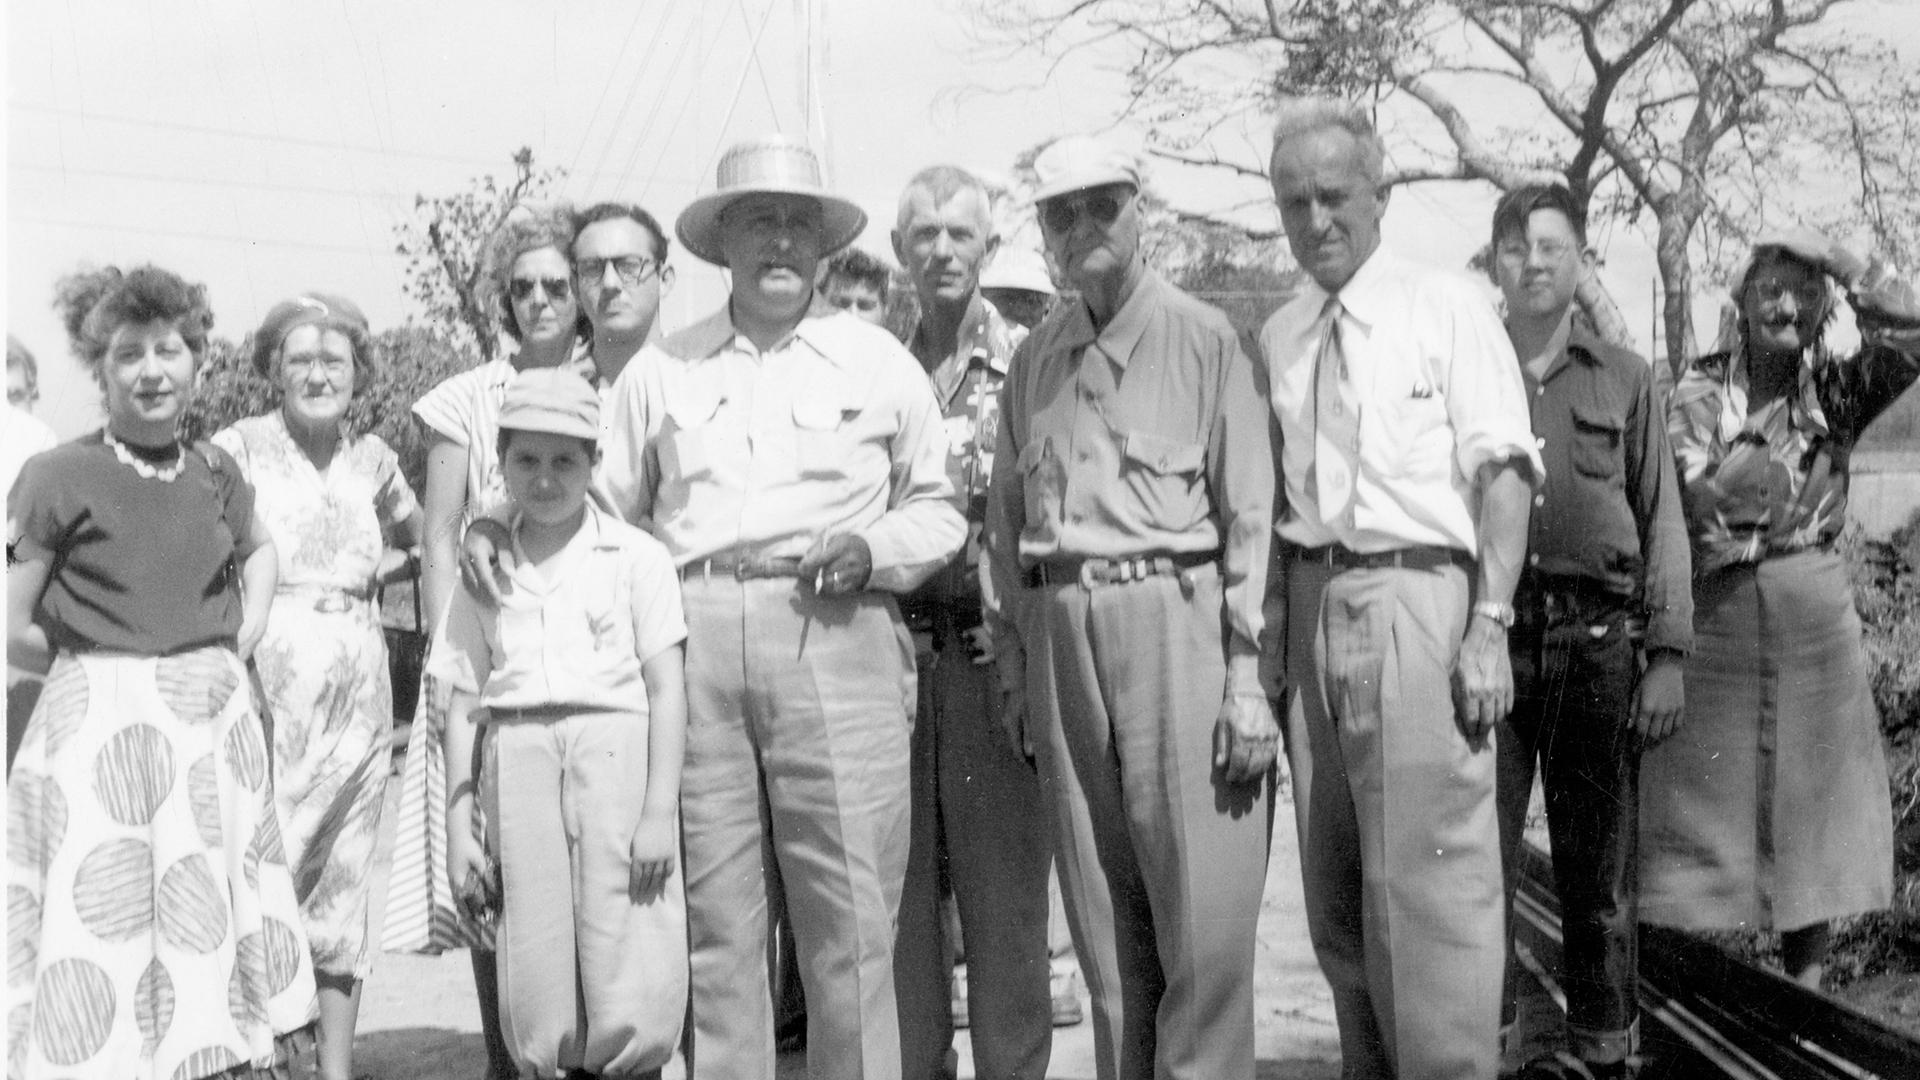 1951-1952-Mexico-Central-America-President-of-Nicaragua-Sugarcane-Plantation-Tour